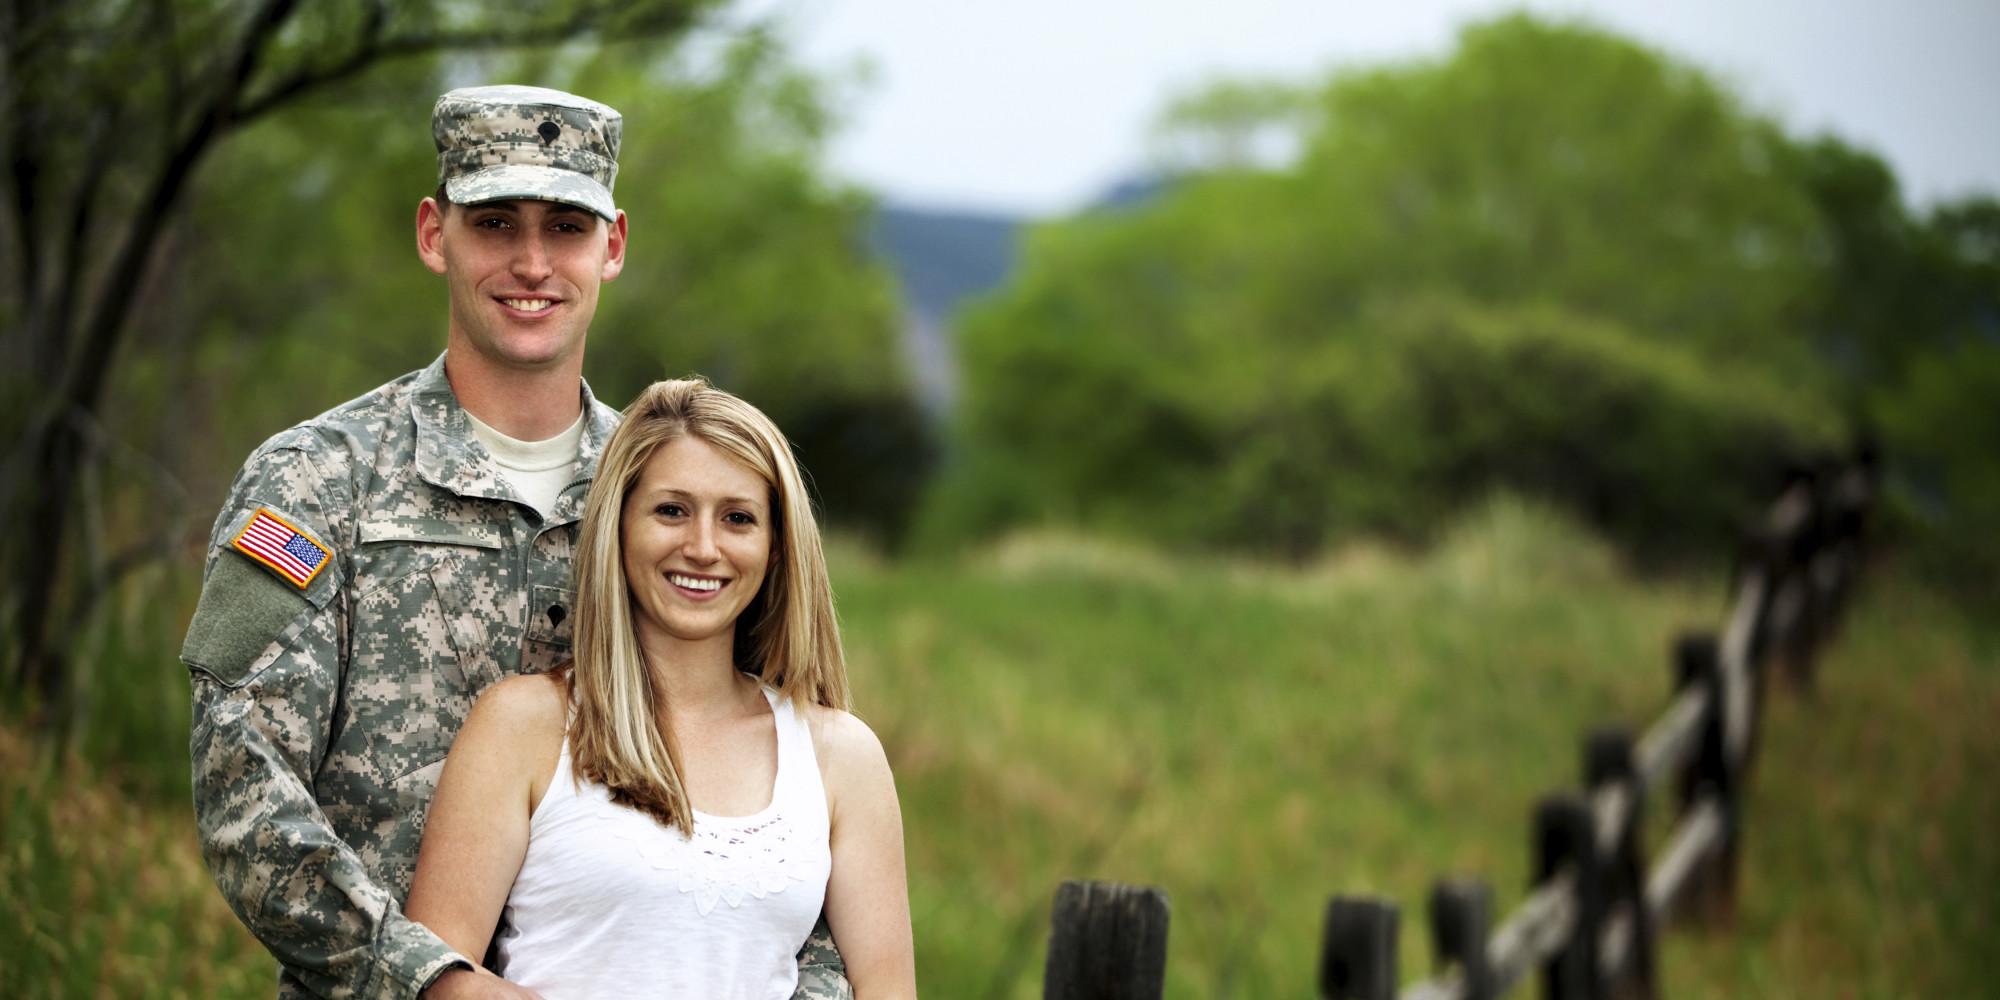 Army Wife Tumblr O-military-spouse-facebook.jpg